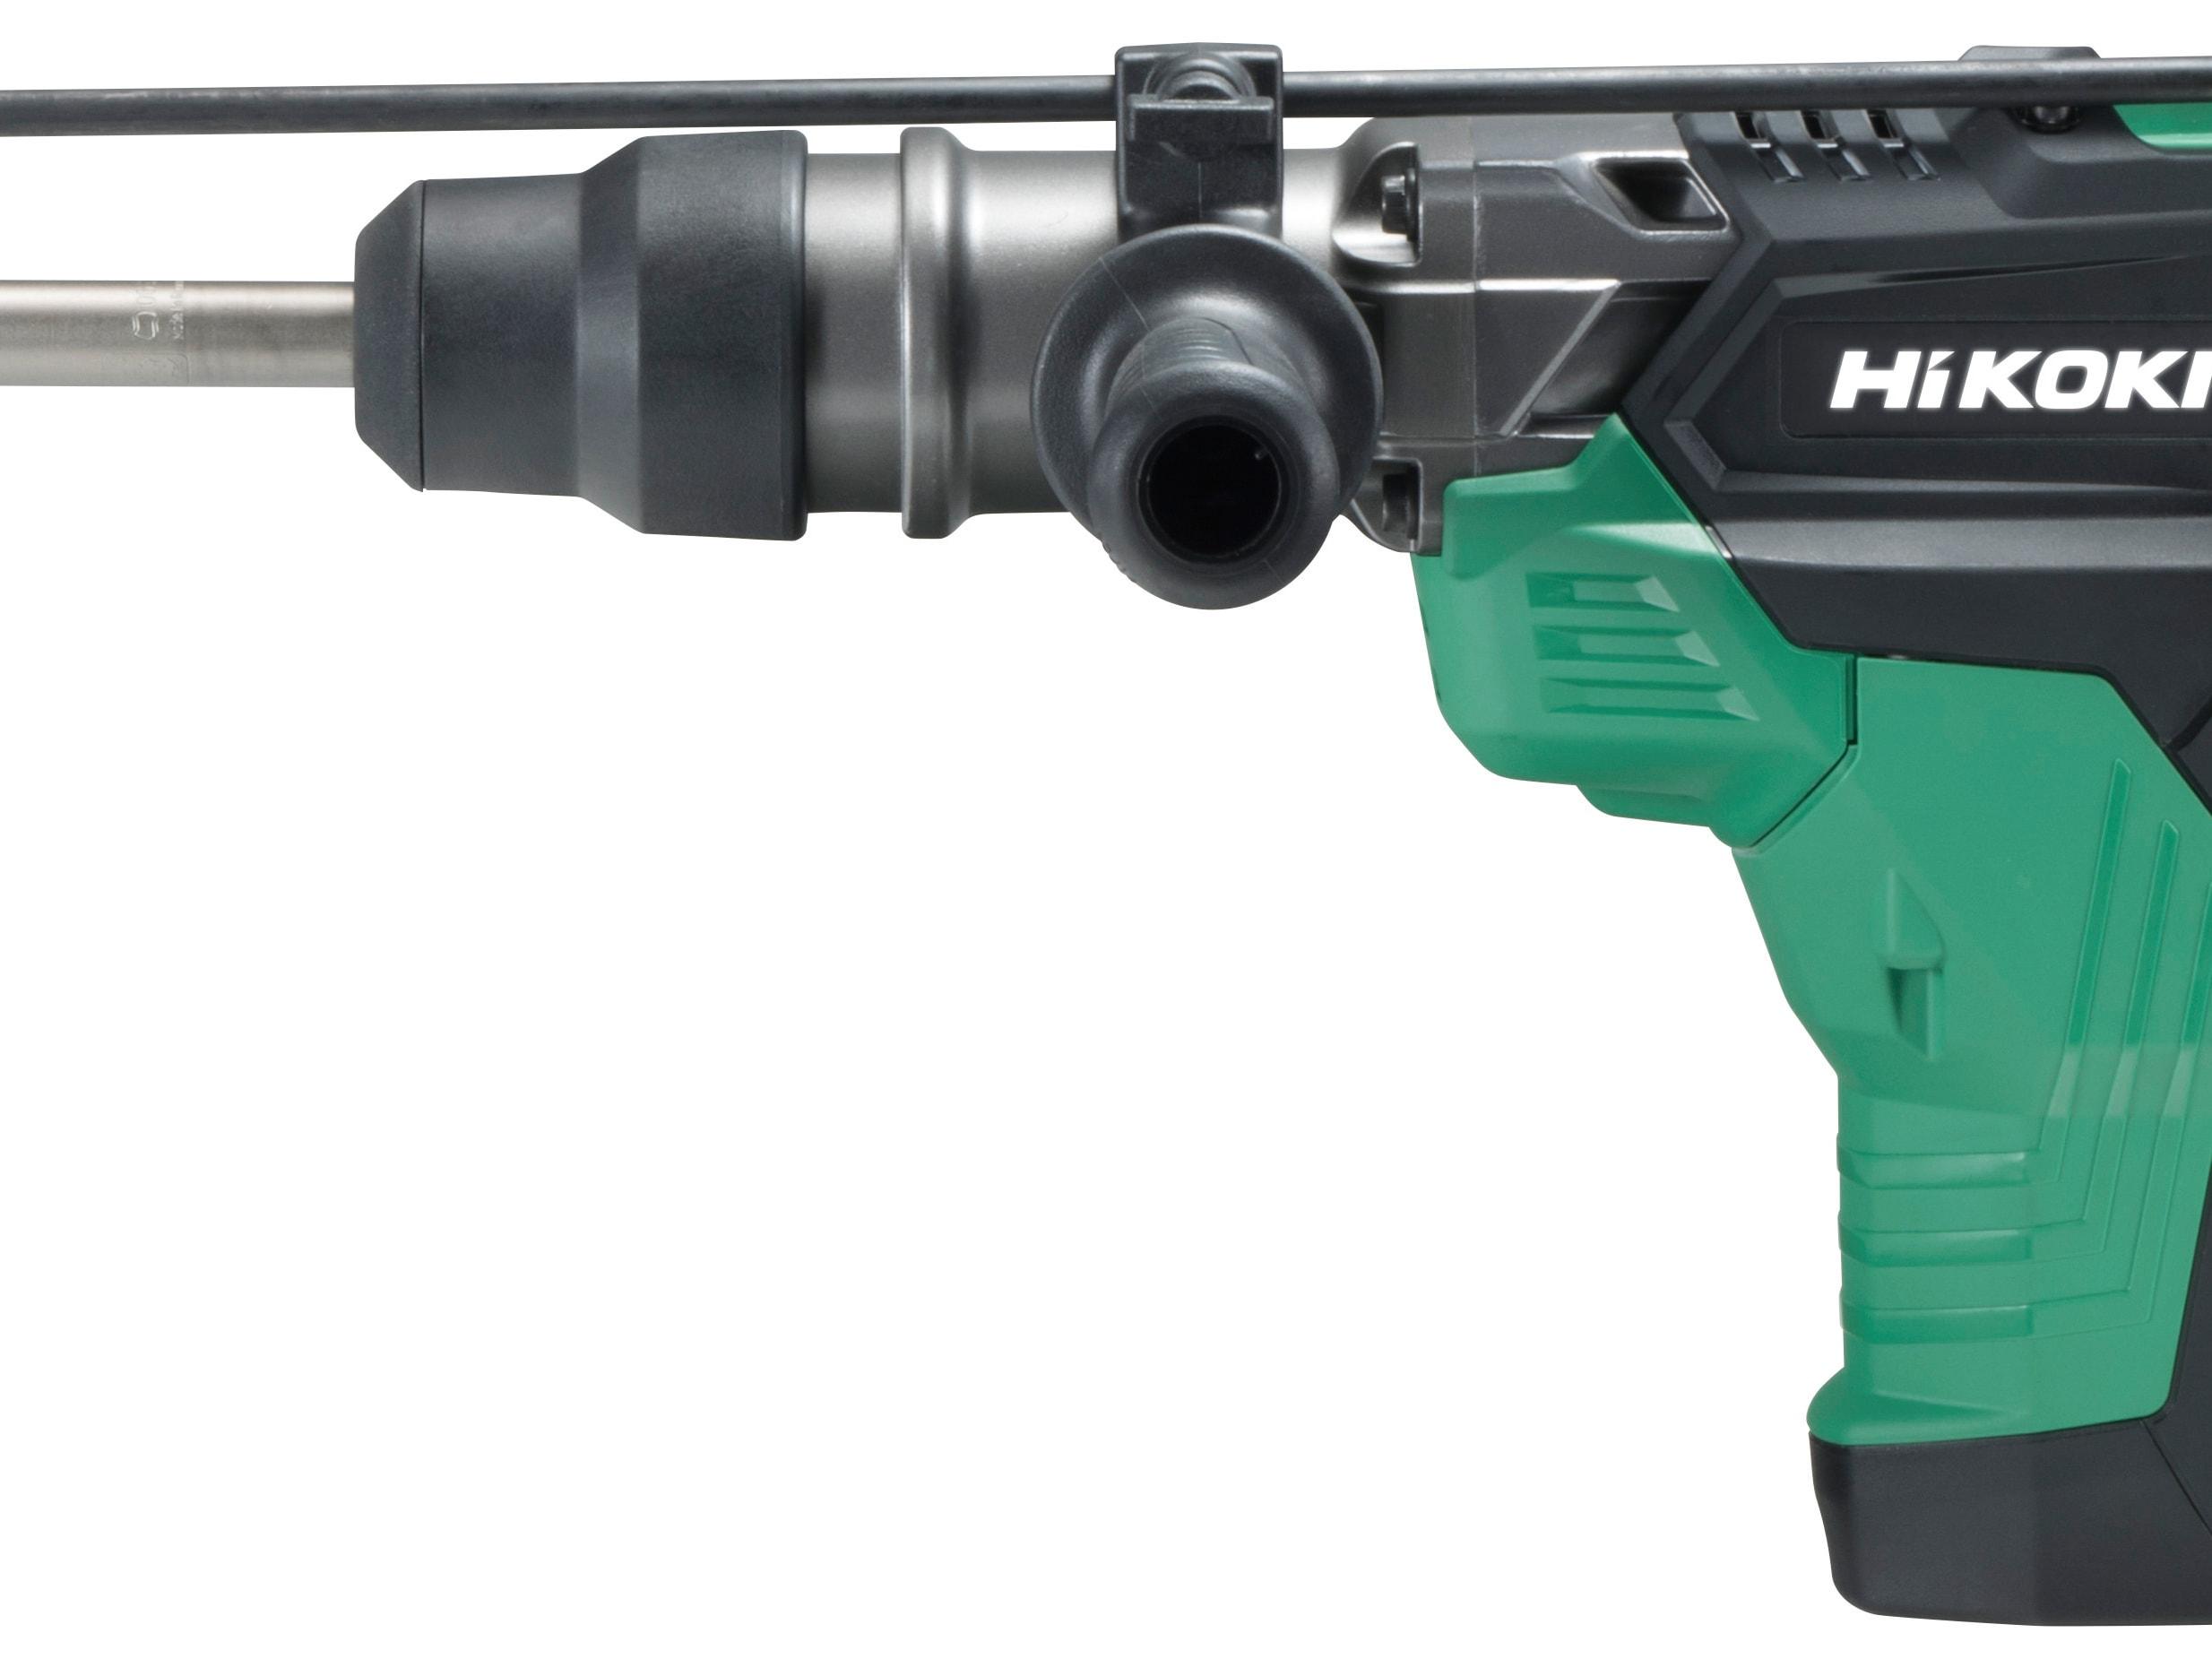 Hikoki Power Tools Sweden AB - HiKOKI - High Performance